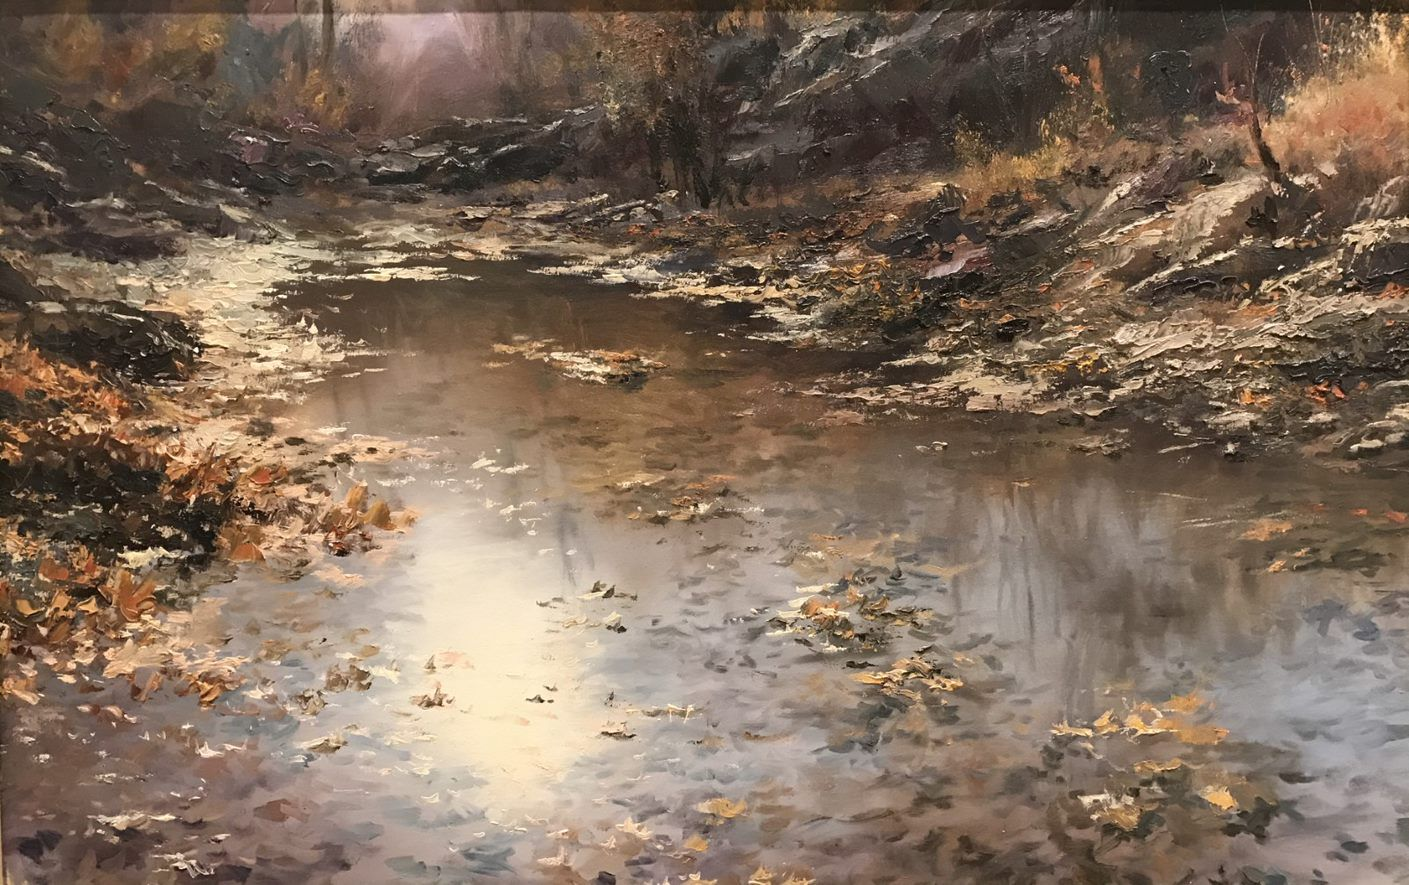 'Reflection' by Faramarz Mokhtarpour, Winner 2017